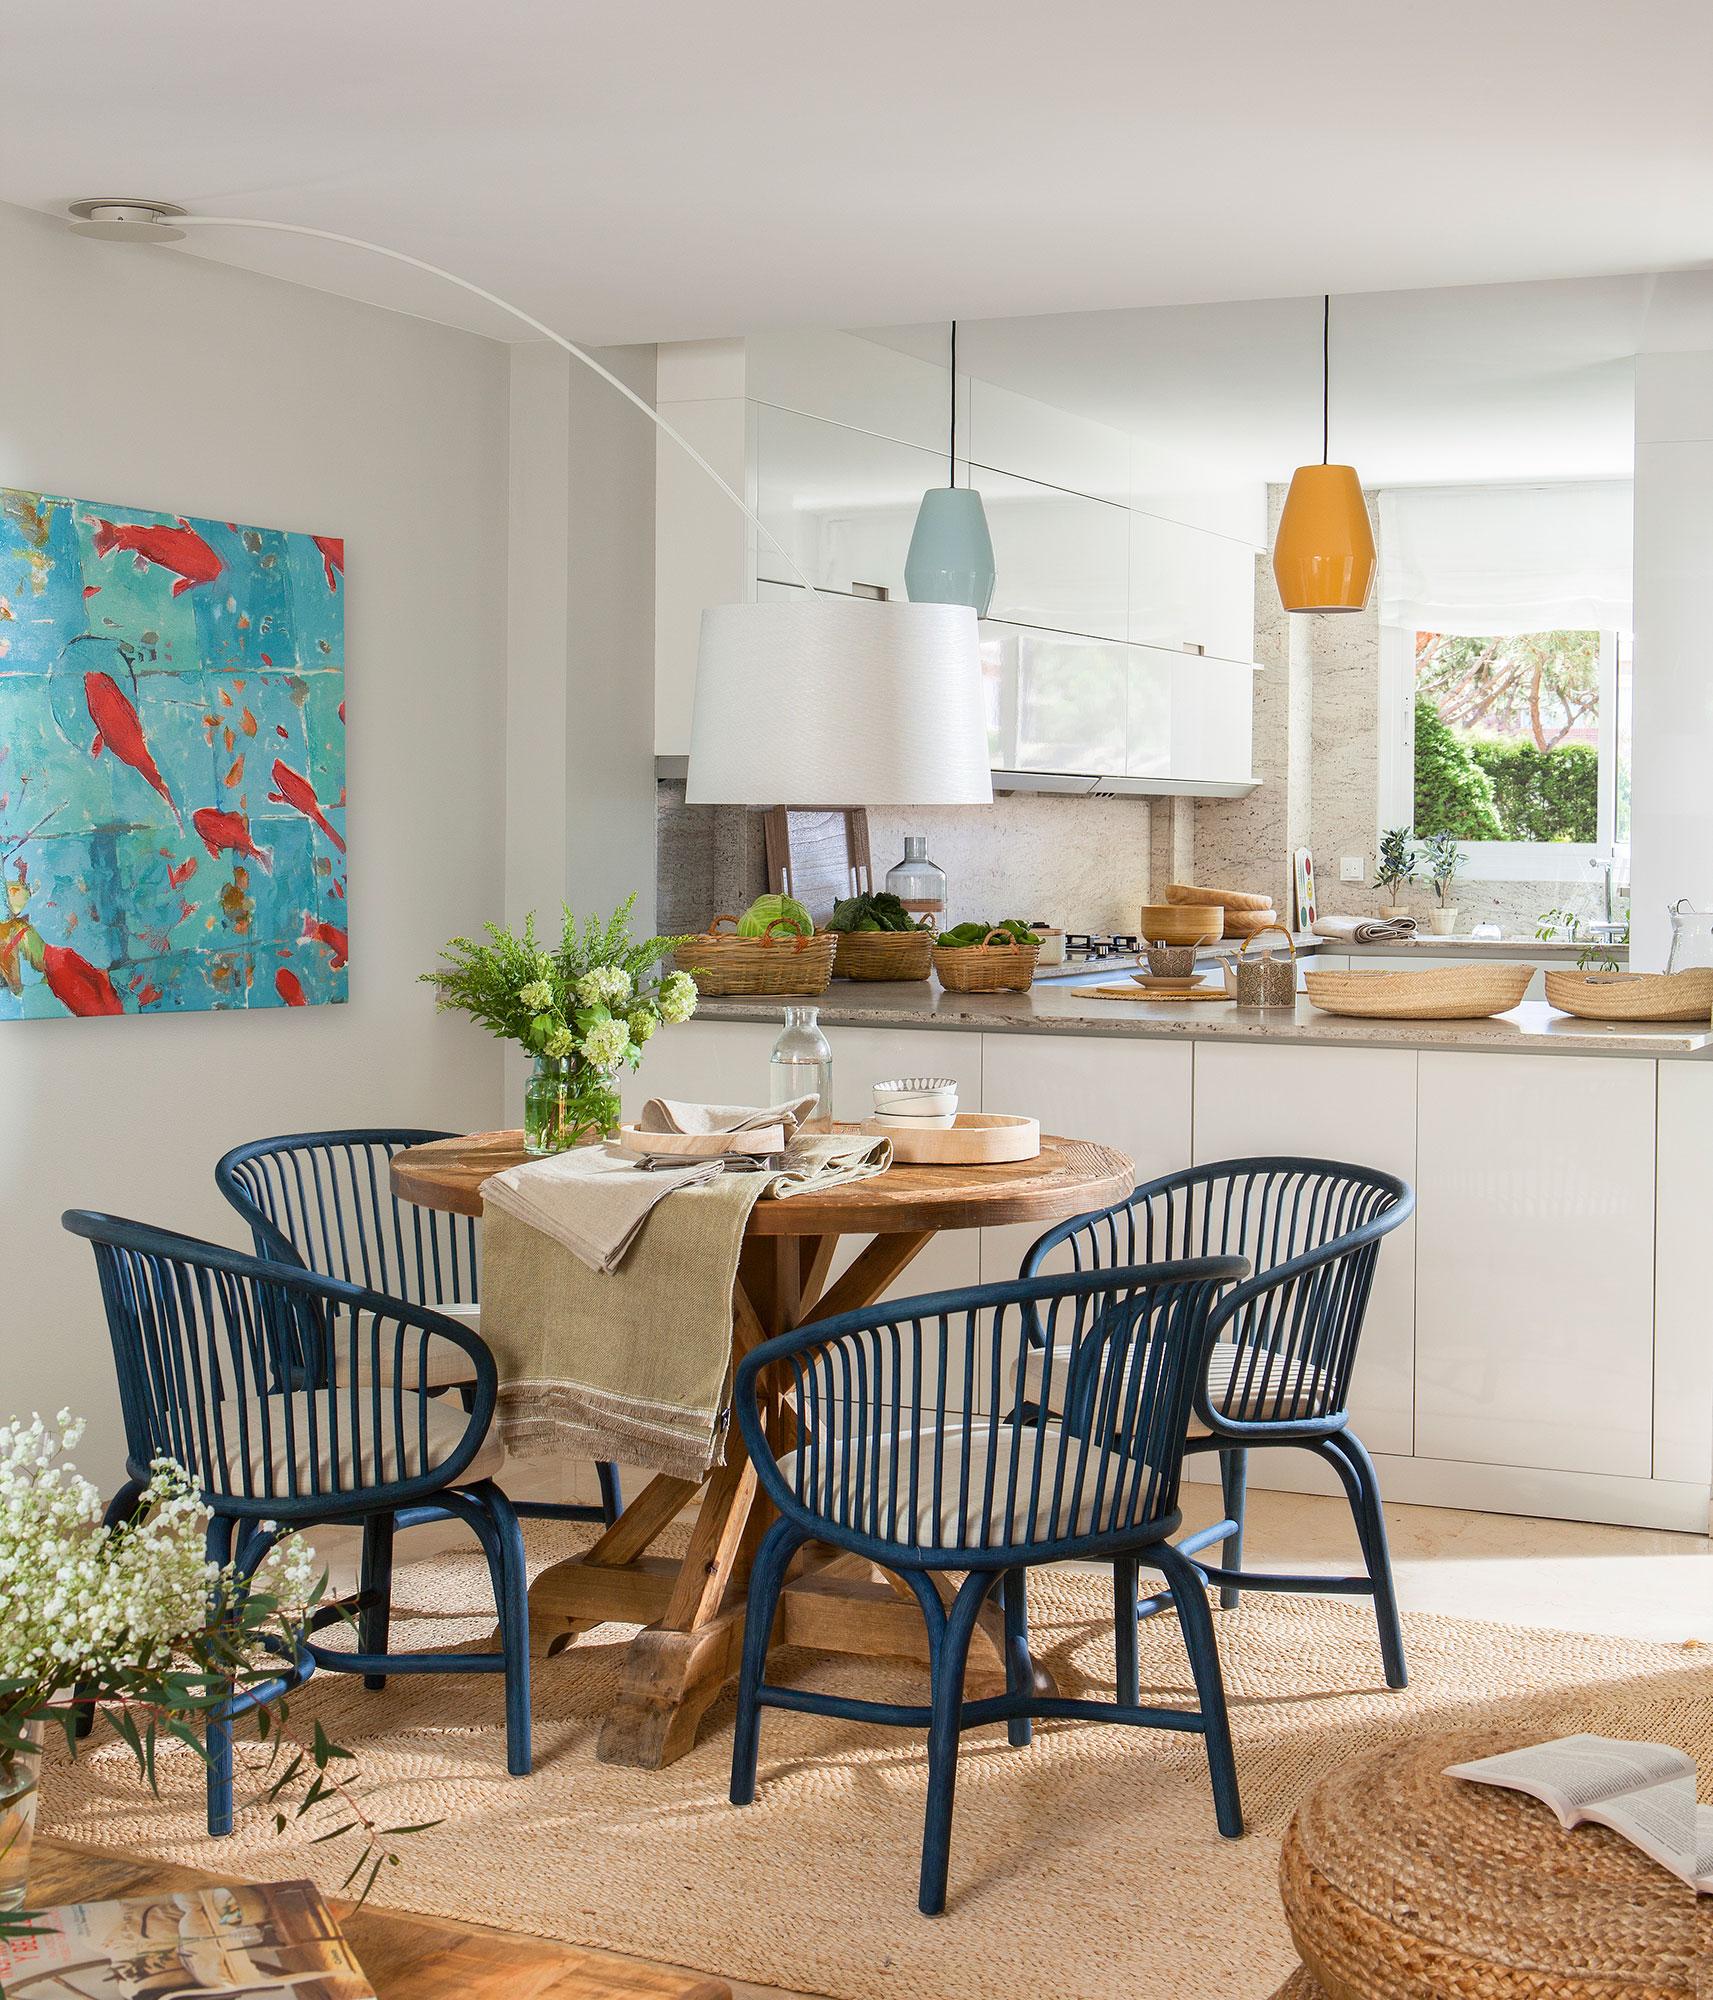 Sillas rusticas para comedor terraza sillas mesa pulido for Sillas comodas comedor